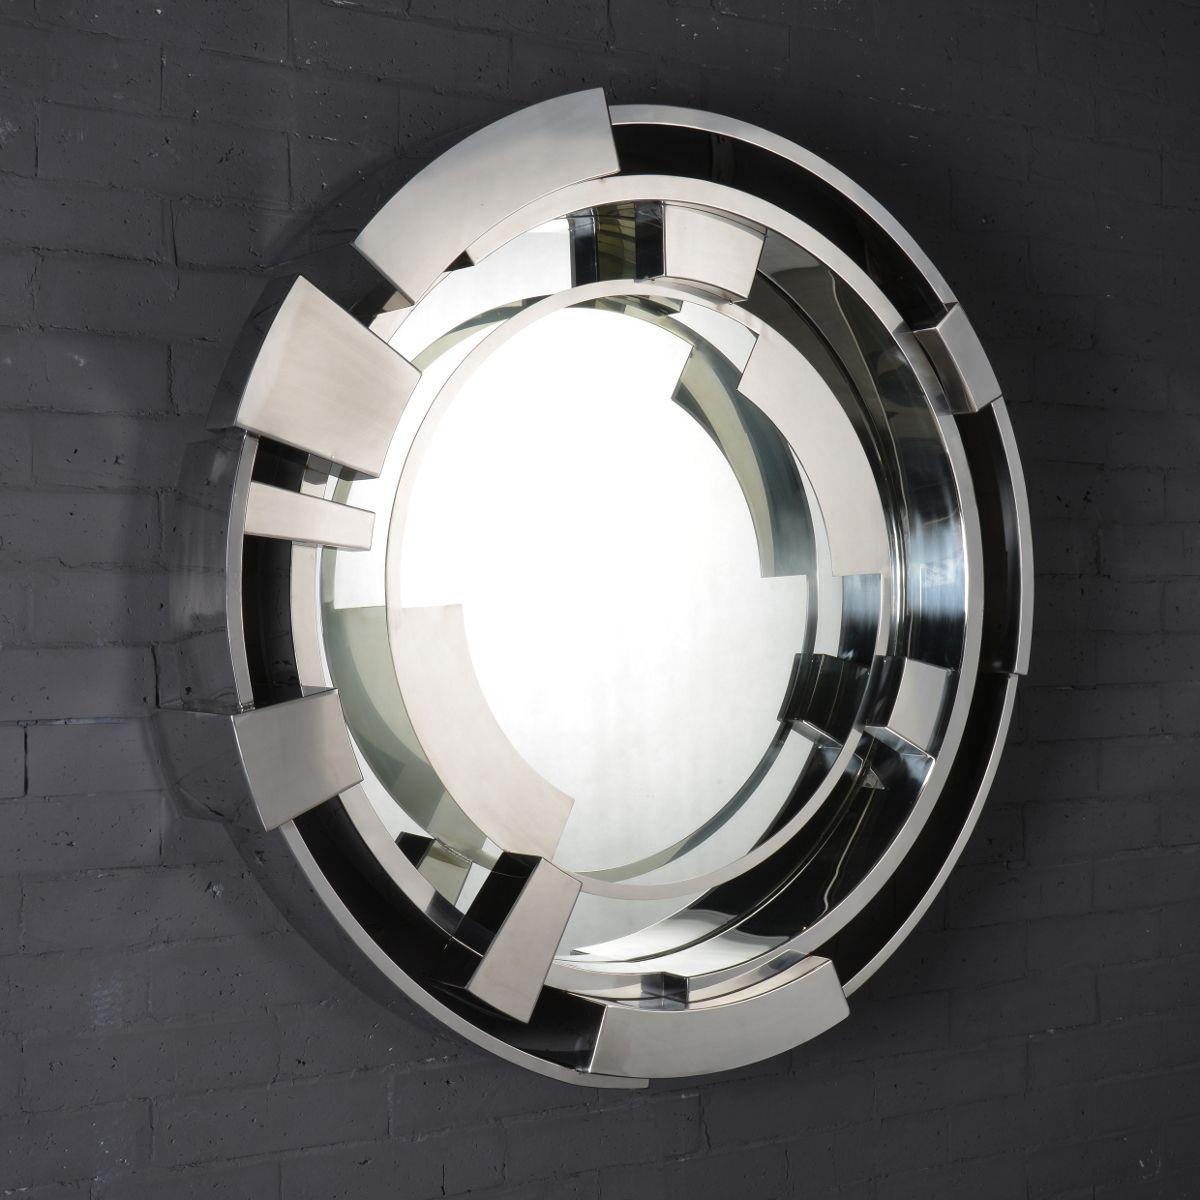 Зеркало VORTEX Коллекция Vortex by Michael Yeung Design   дизайн Michael Yeung